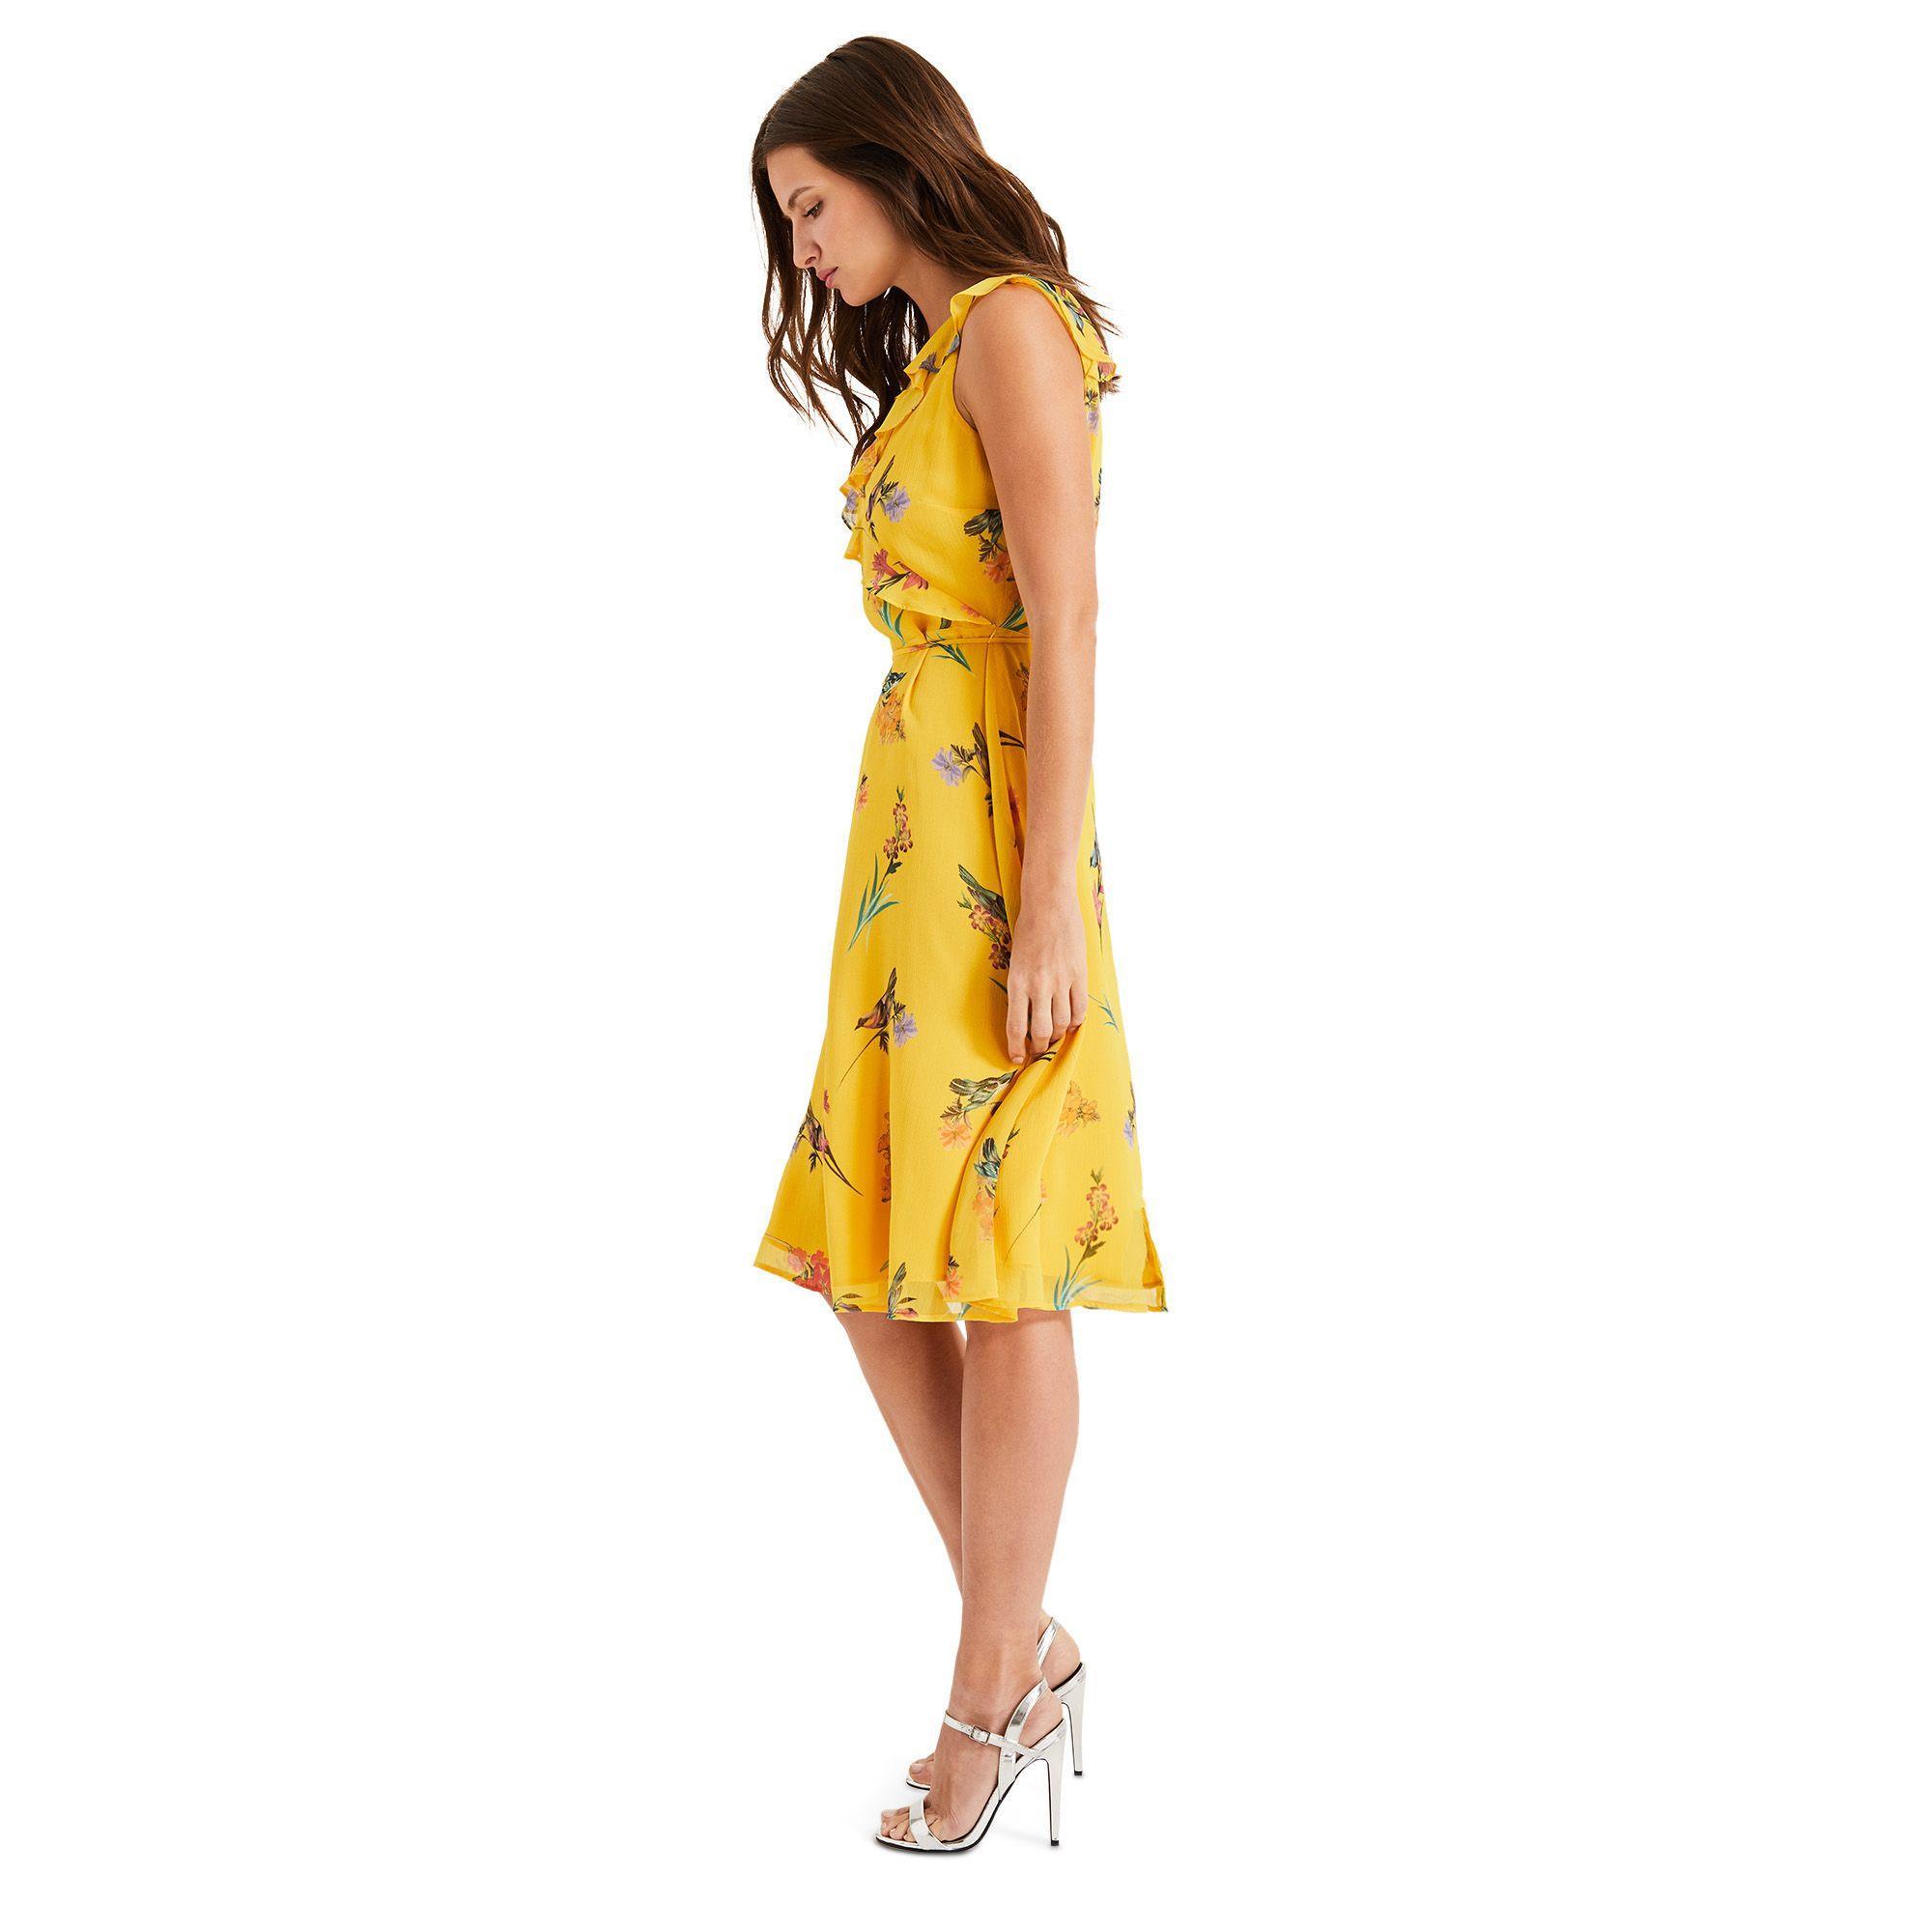 4d266fc97a9 Phase Eight - Yellow Joss Floral Printed Chiffon Dress - Lyst. View  fullscreen